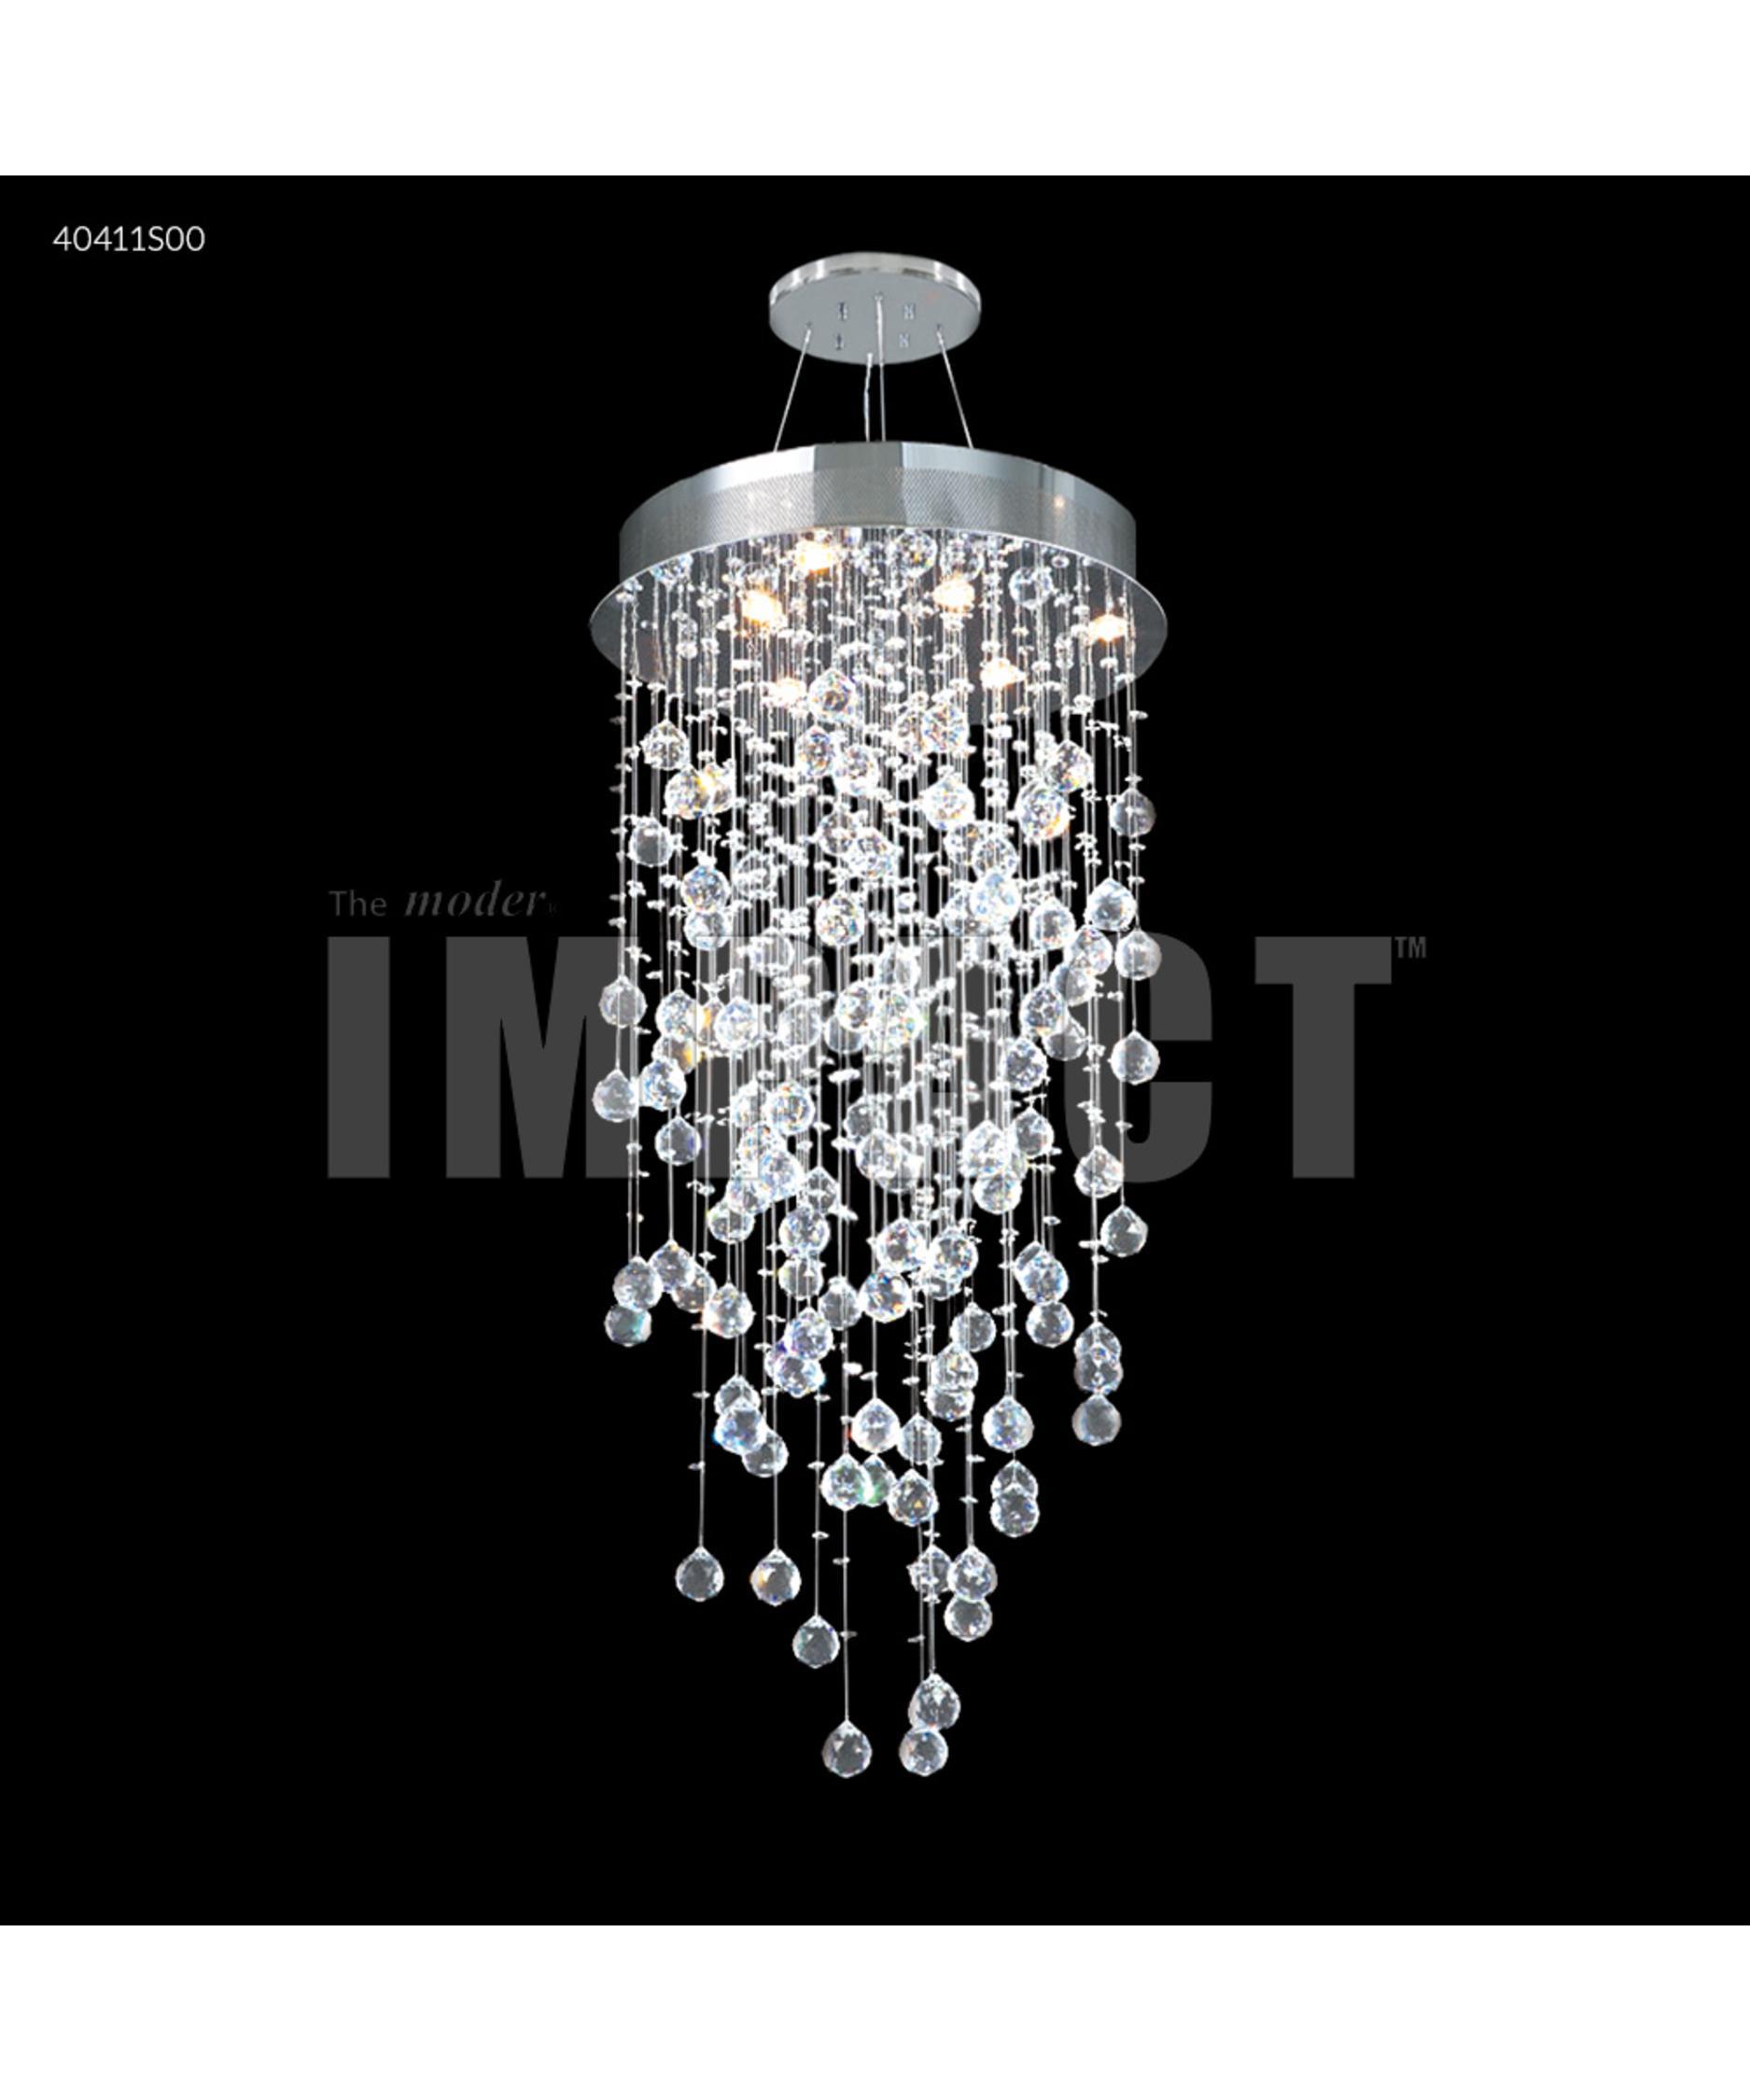 James Moder Chandeliers: James R Moder Crystal Rain 20 Inch Wide 6 Light Mini Chandelier   Capitol  Lighting 1-800lighting.com,Lighting